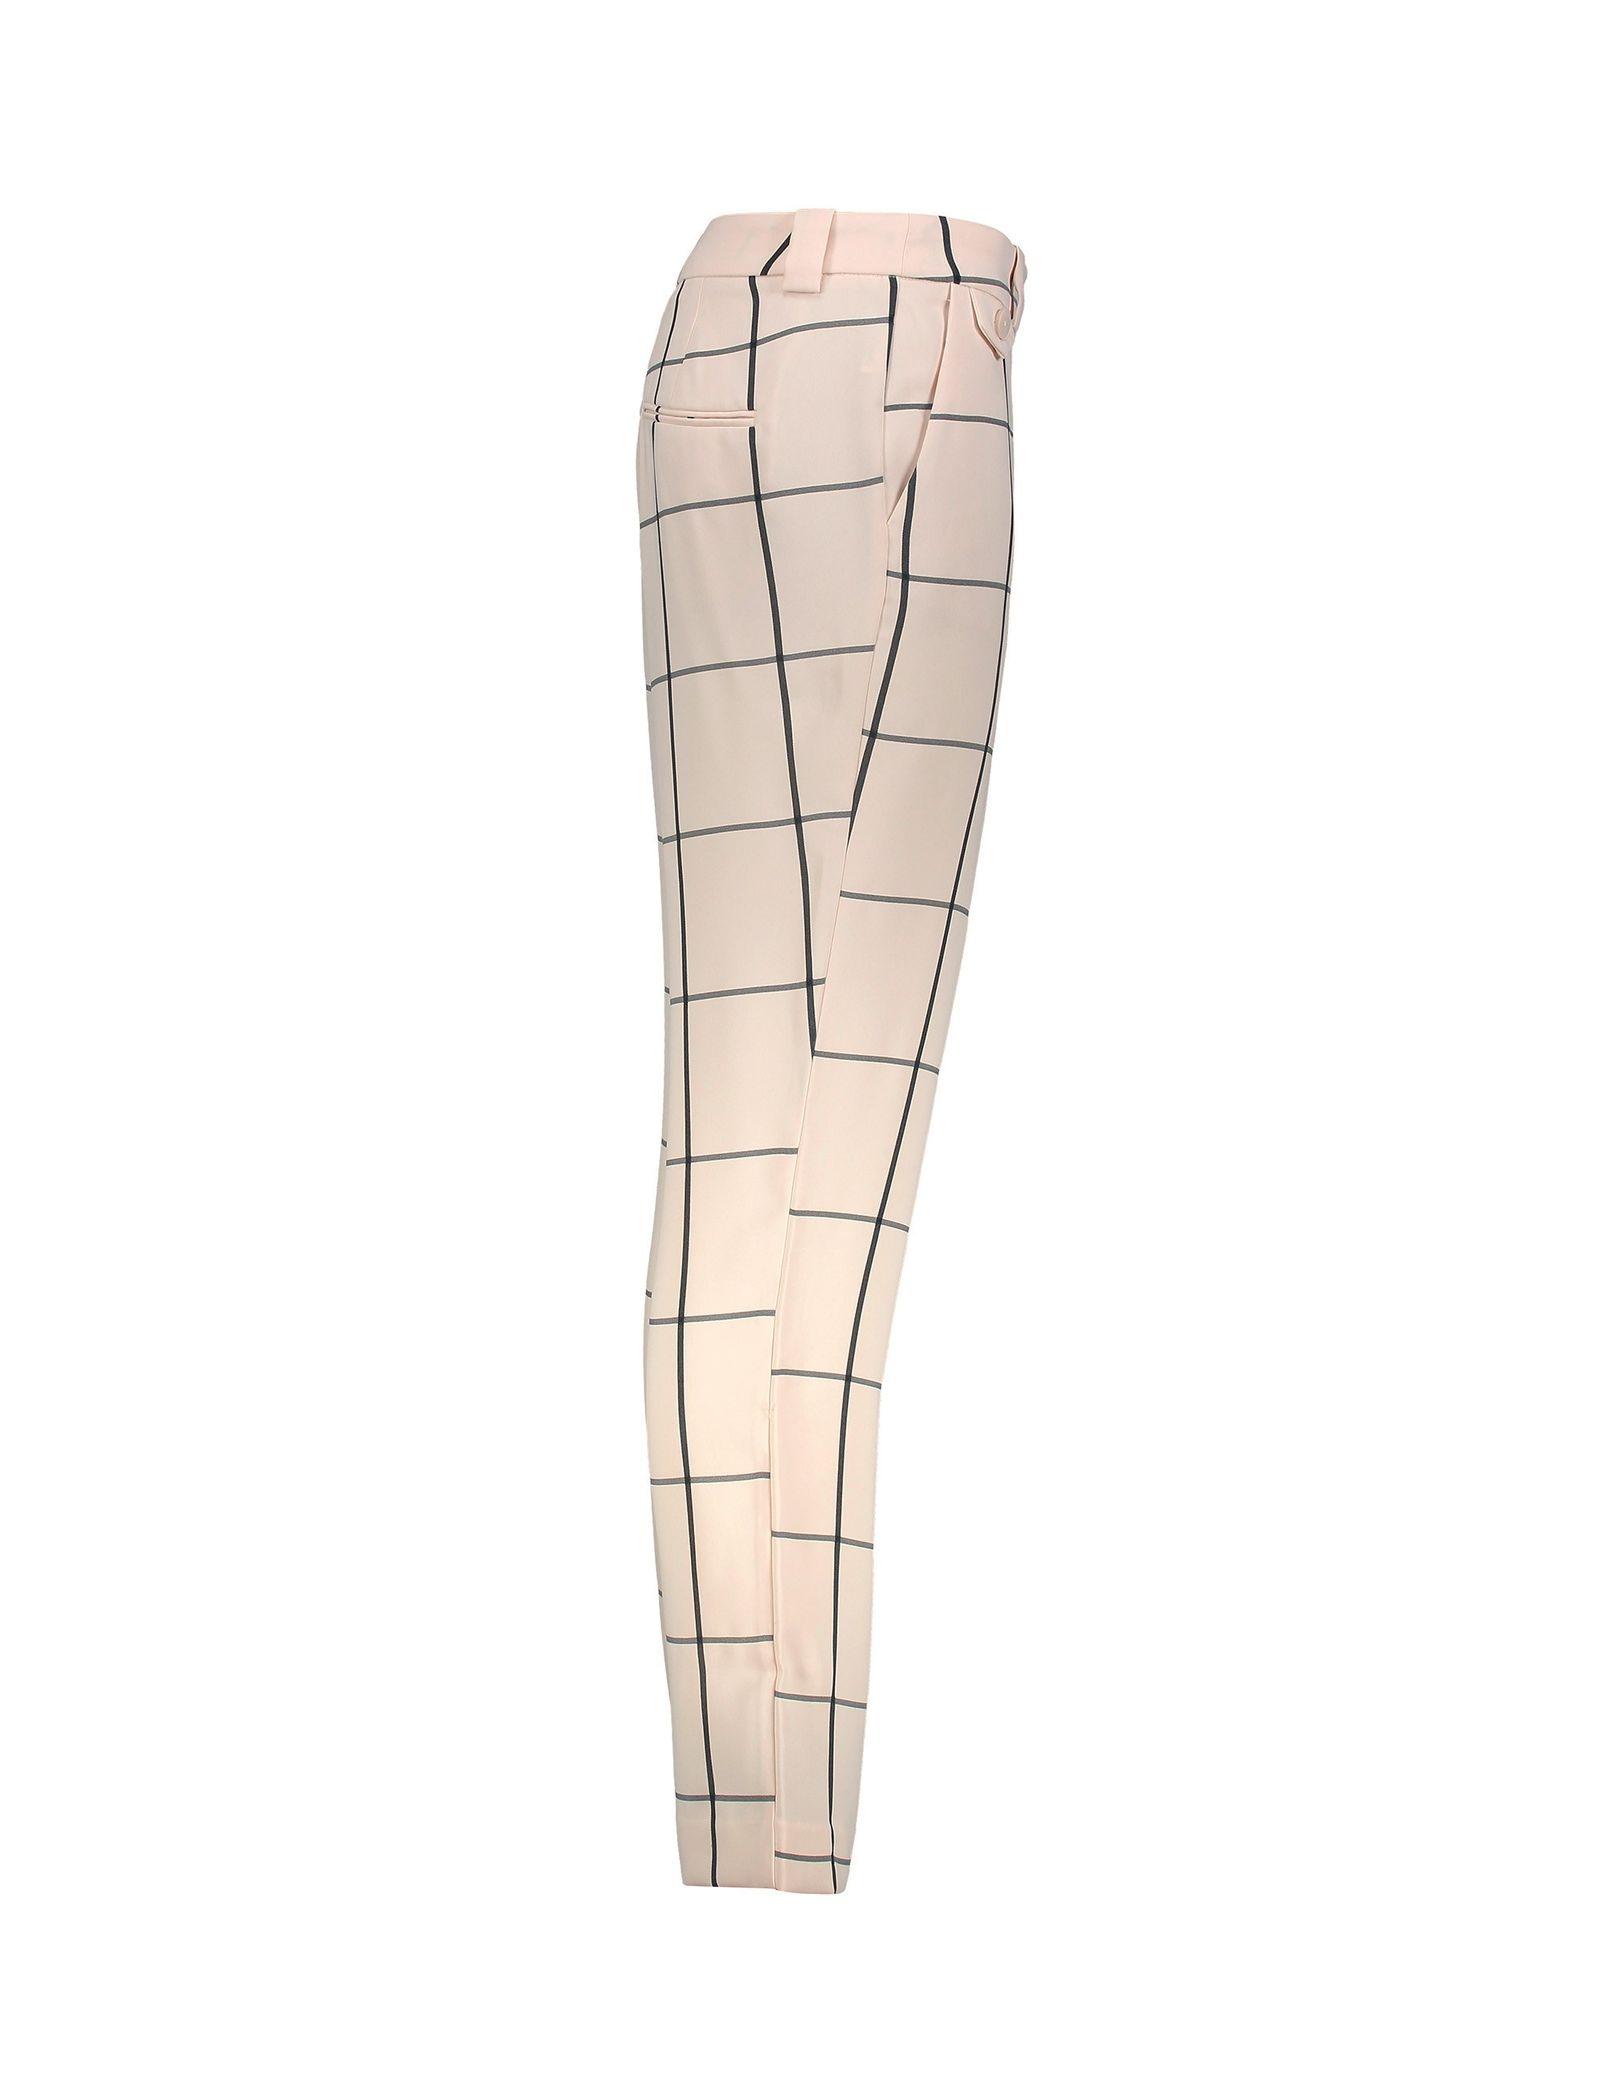 شلوار راسته زنانه - مانگو - نباتي - 4